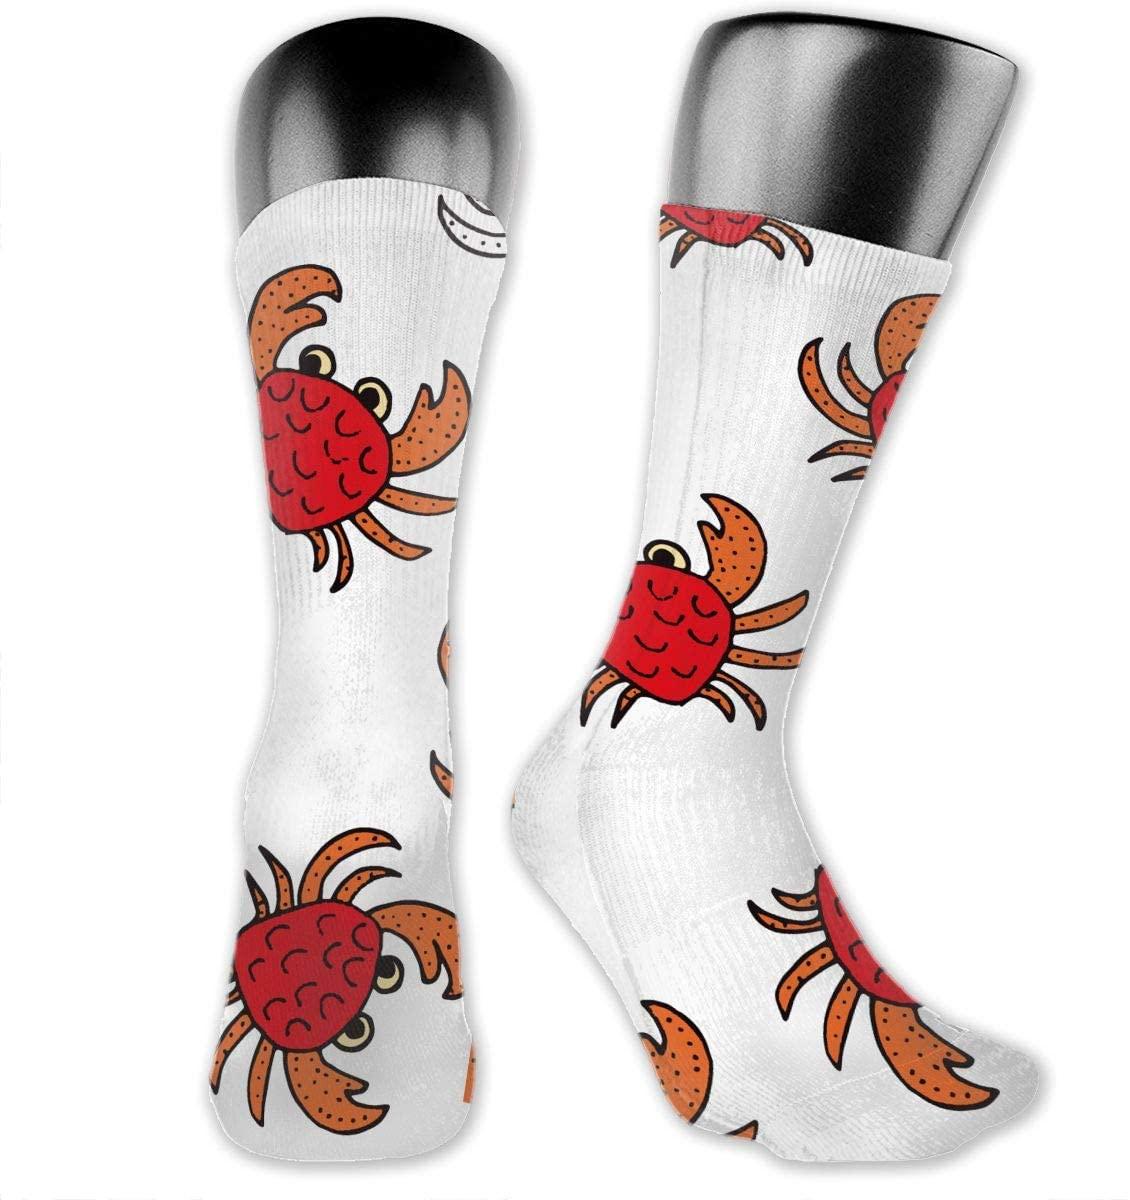 Walking Crab Unisex Outdoor Long Socks Sport Athletic Crew Socks Stockings